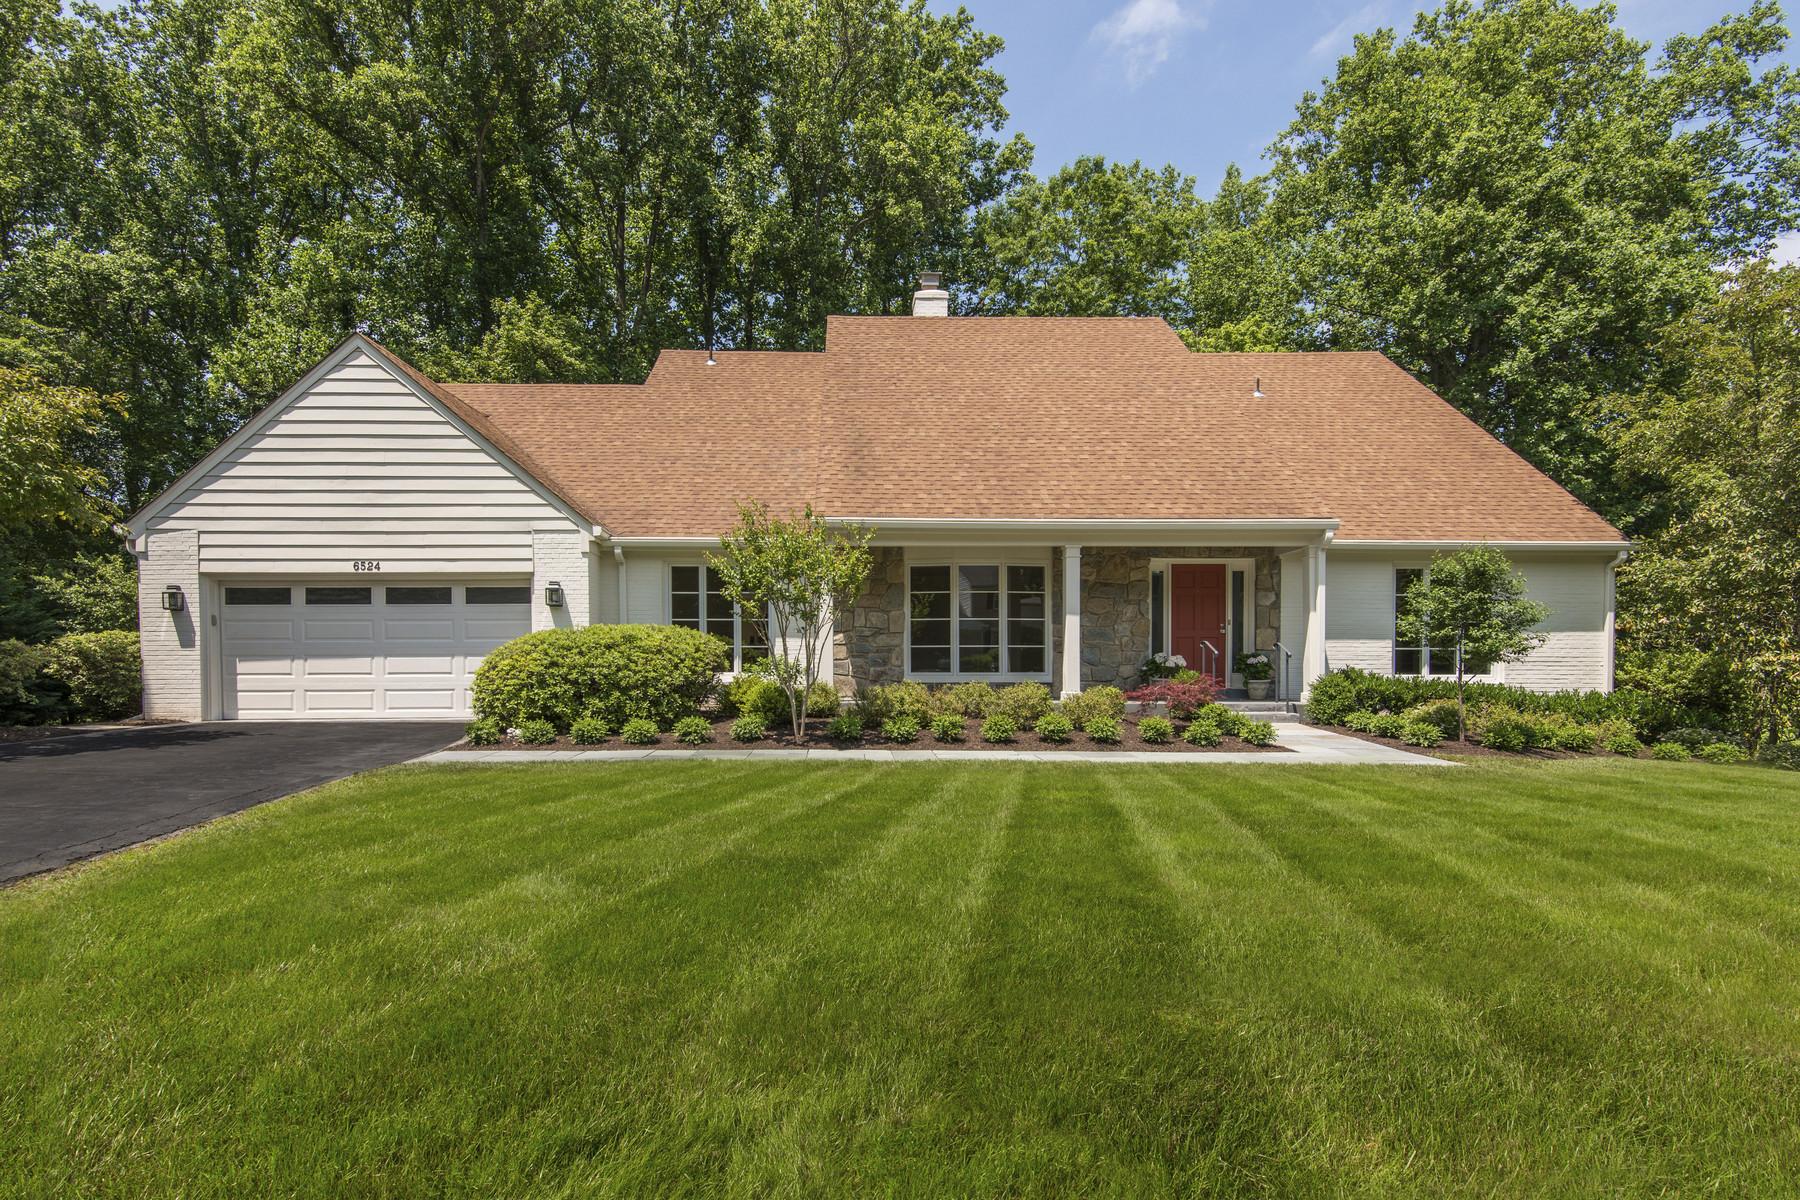 獨棟家庭住宅 為 出售 在 6524 Sunny Hill Court, Mclean 6524 Sunny Hill Ct McLean, 弗吉尼亞州, 22101 美國